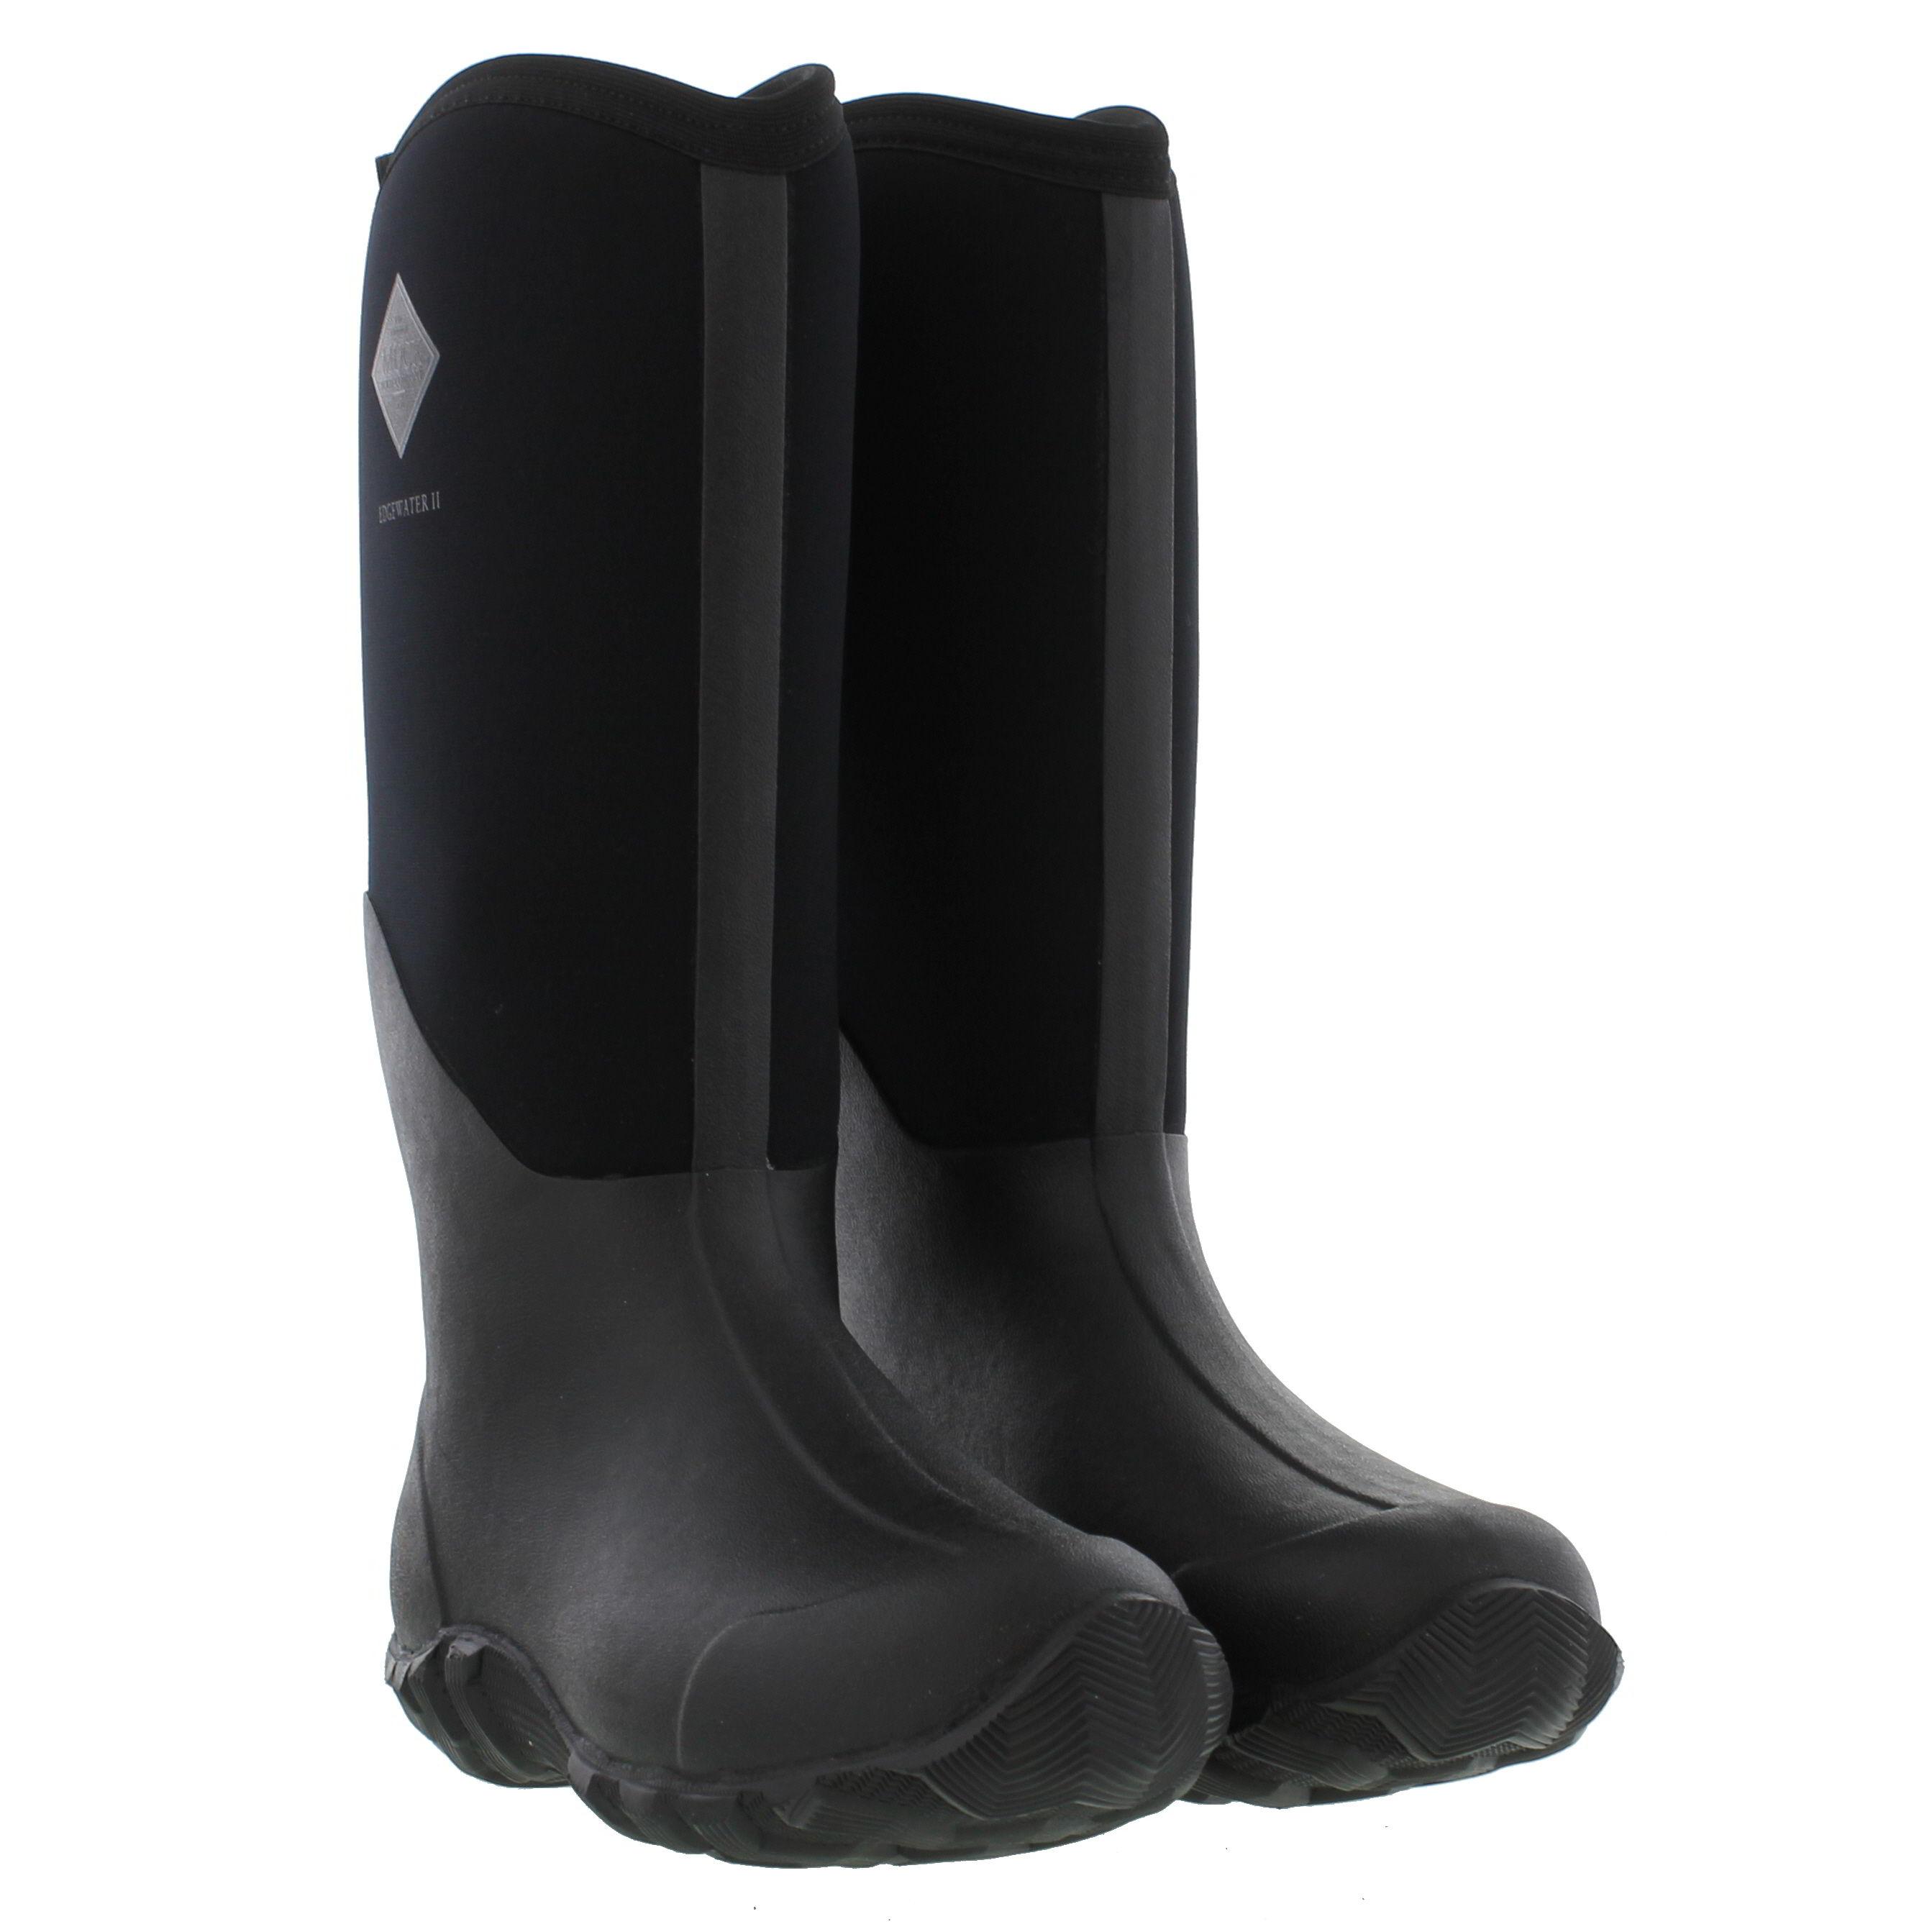 Muck Boots Edgewater II Mens Neoprene Wellies Wellington Boots ...